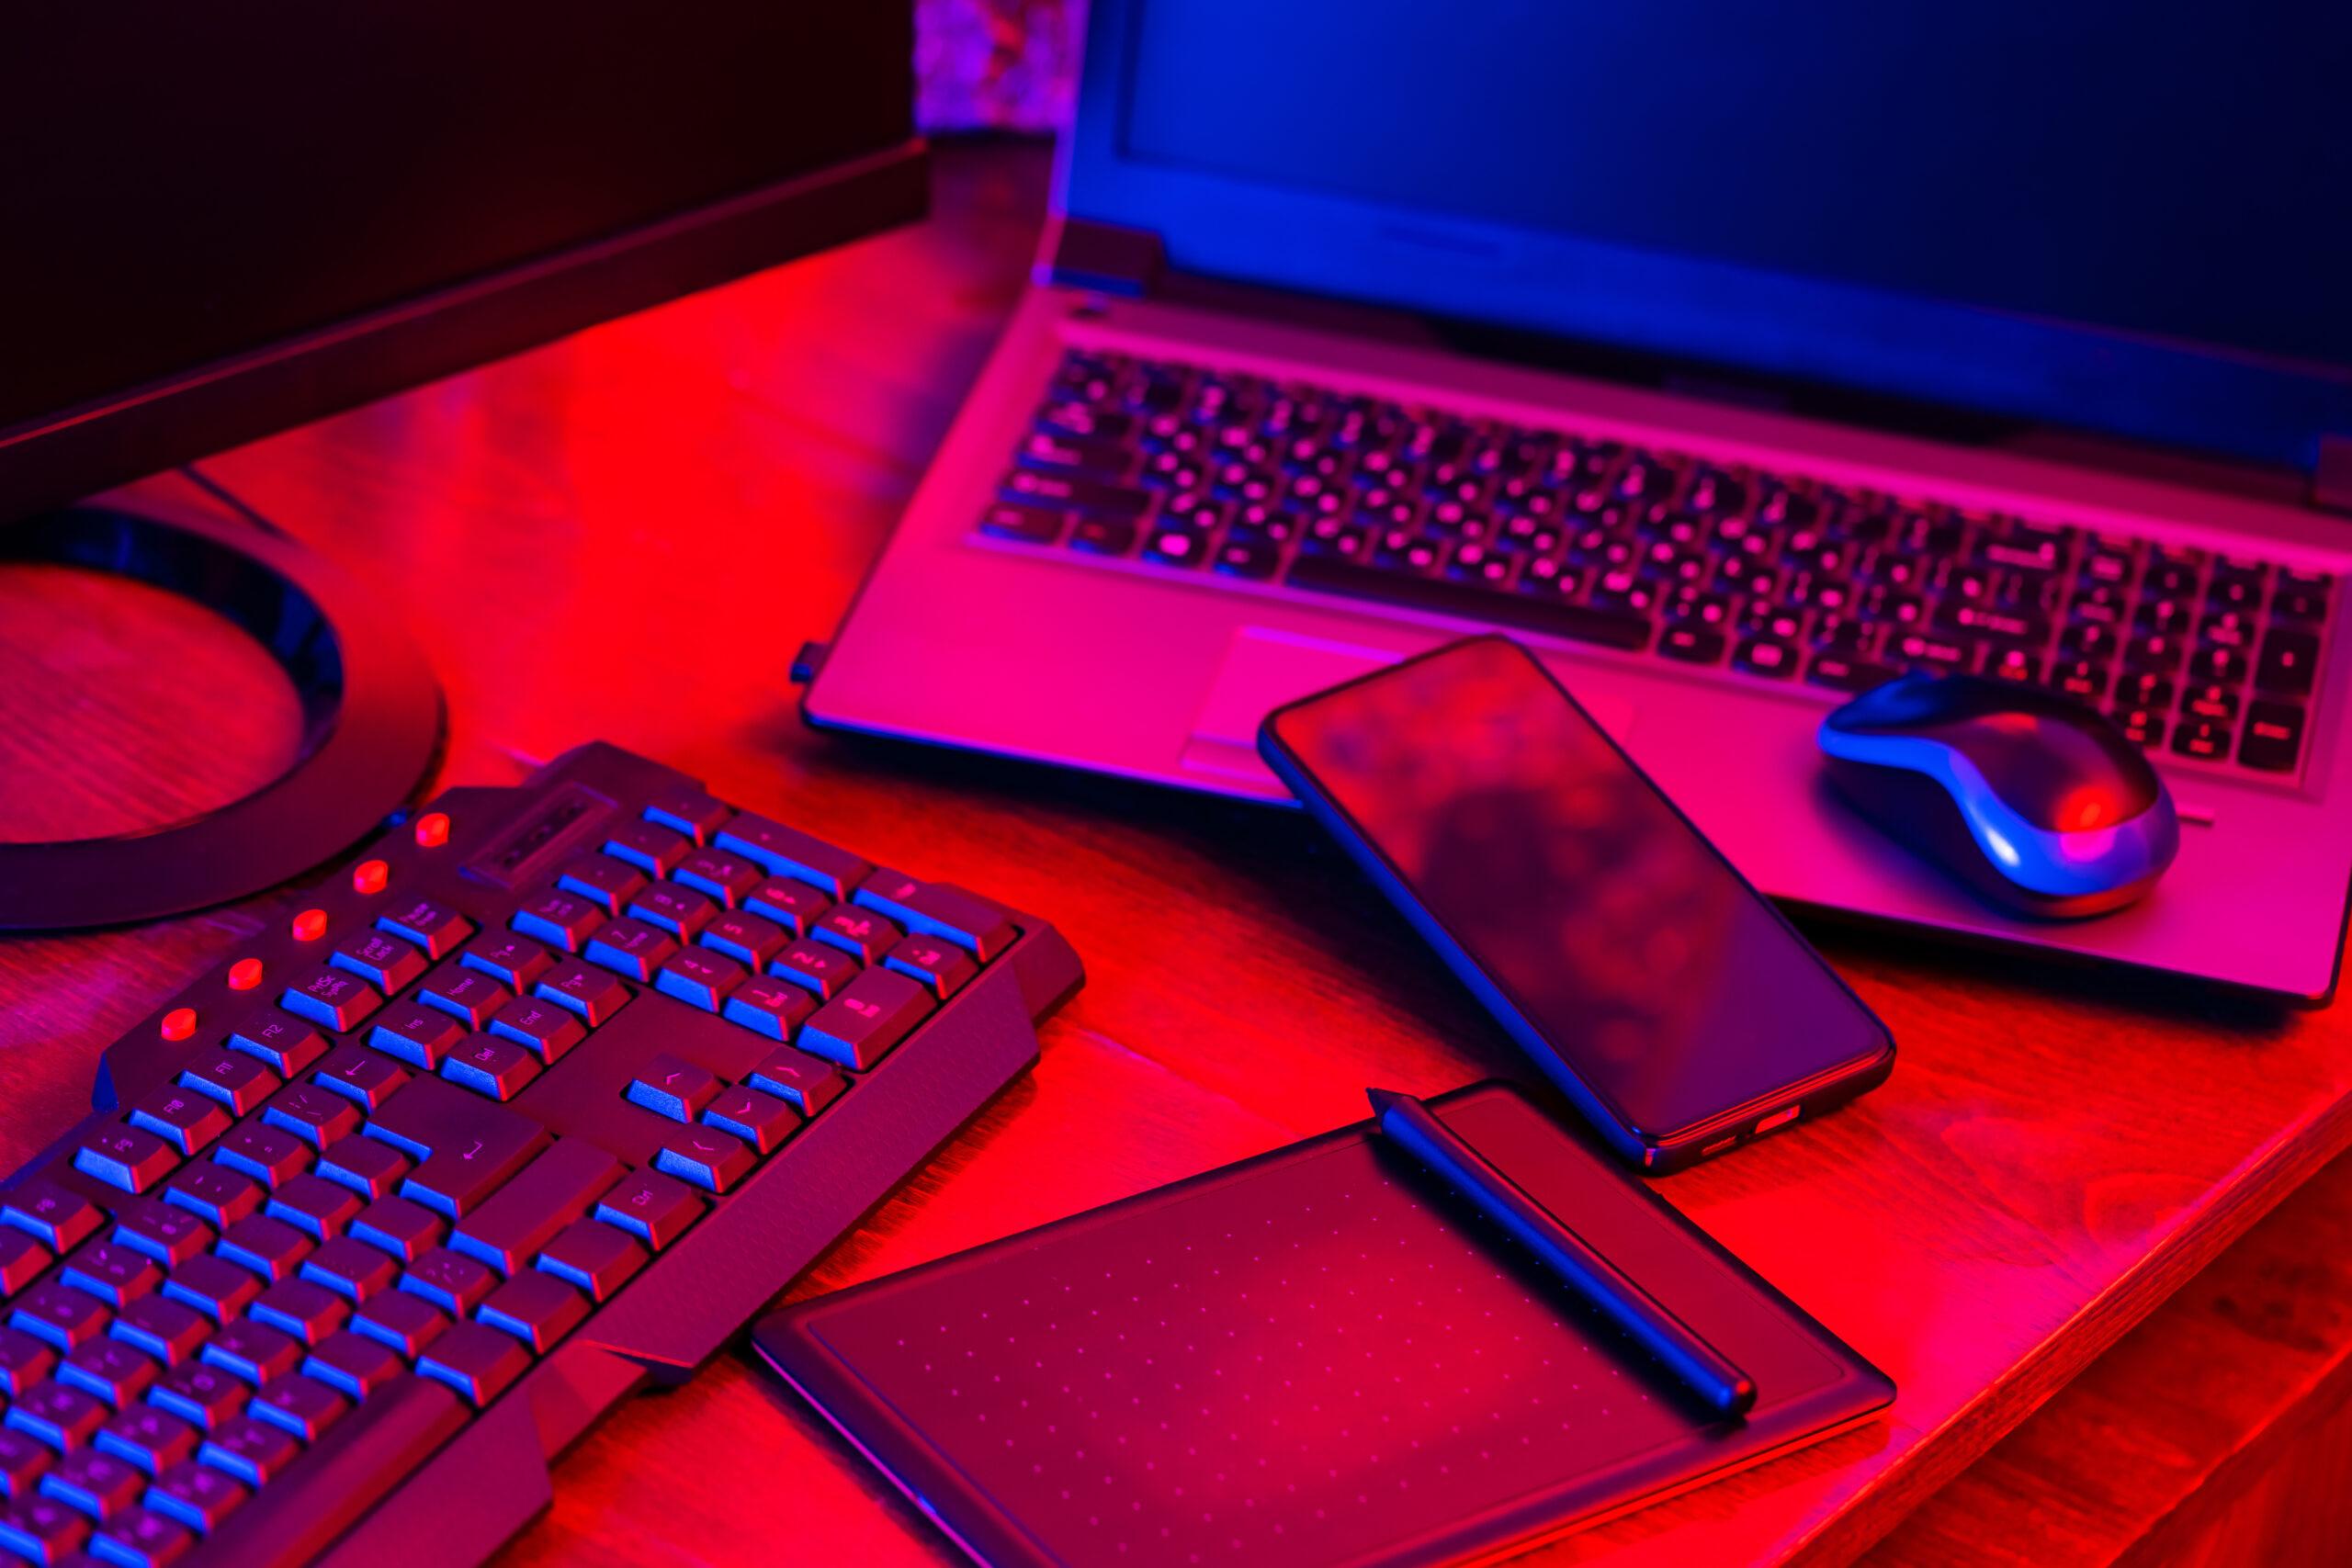 Desktops as a Service Part 2 – Limitations